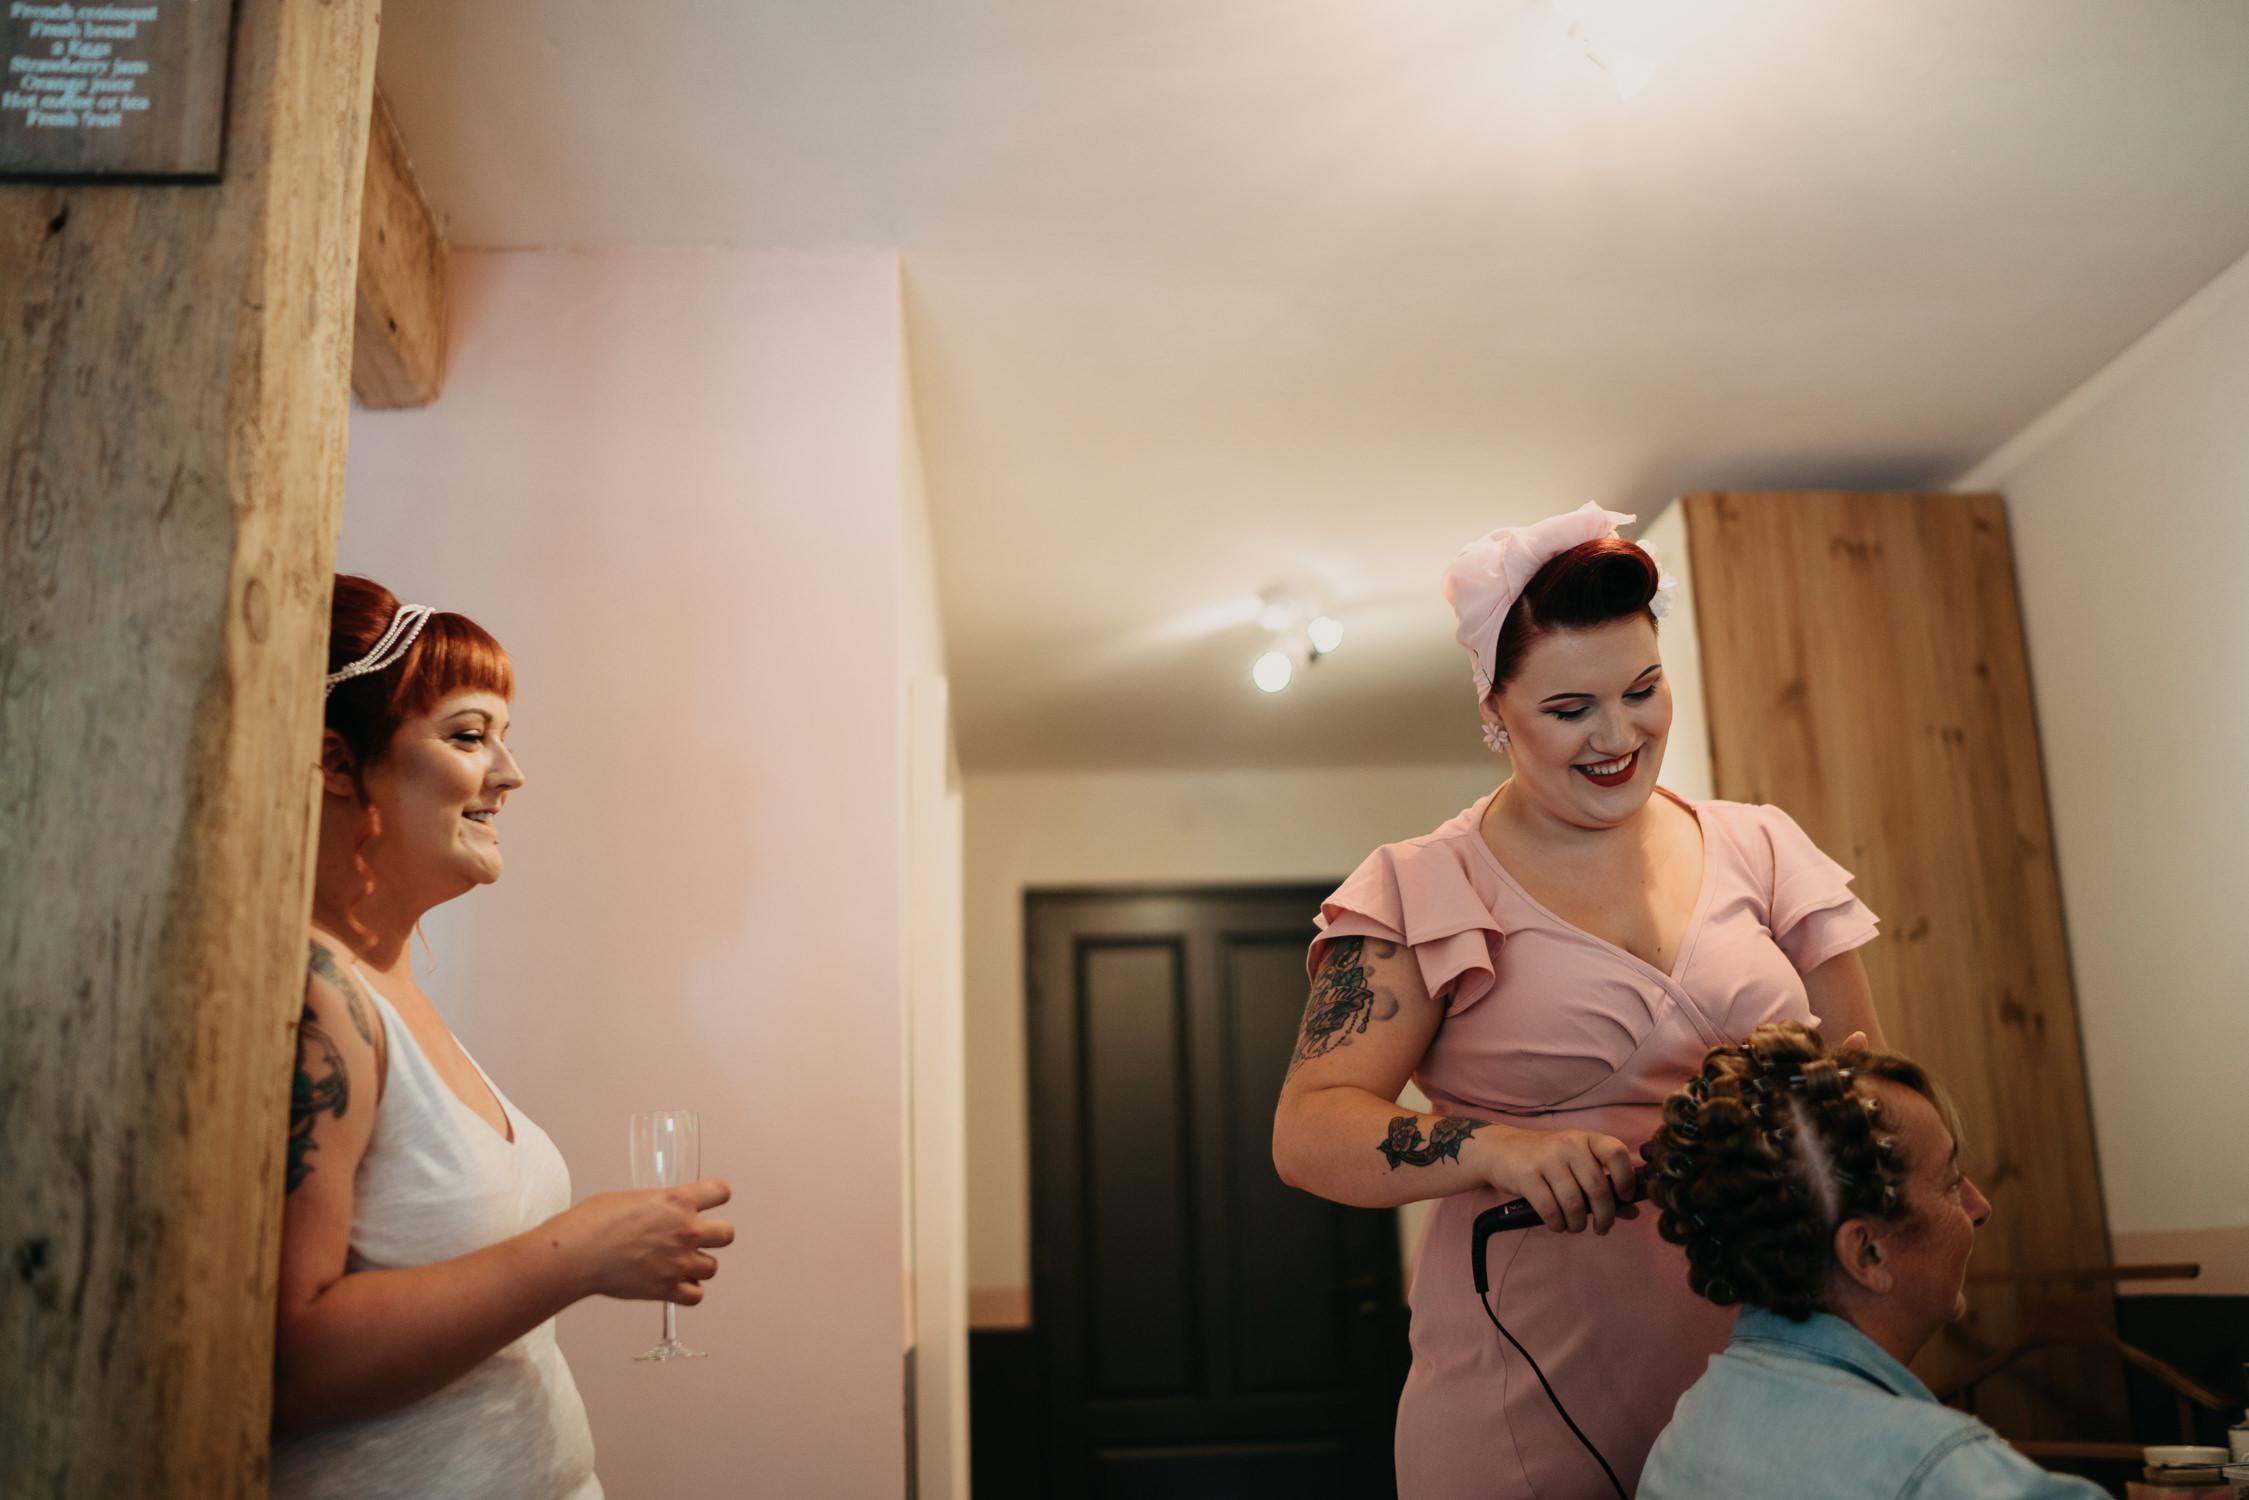 amsterdam-wedding-photographer-bruidsfotografie-trouwfotograaf-mark-hadden-Lucie-Luuk-024.jpg